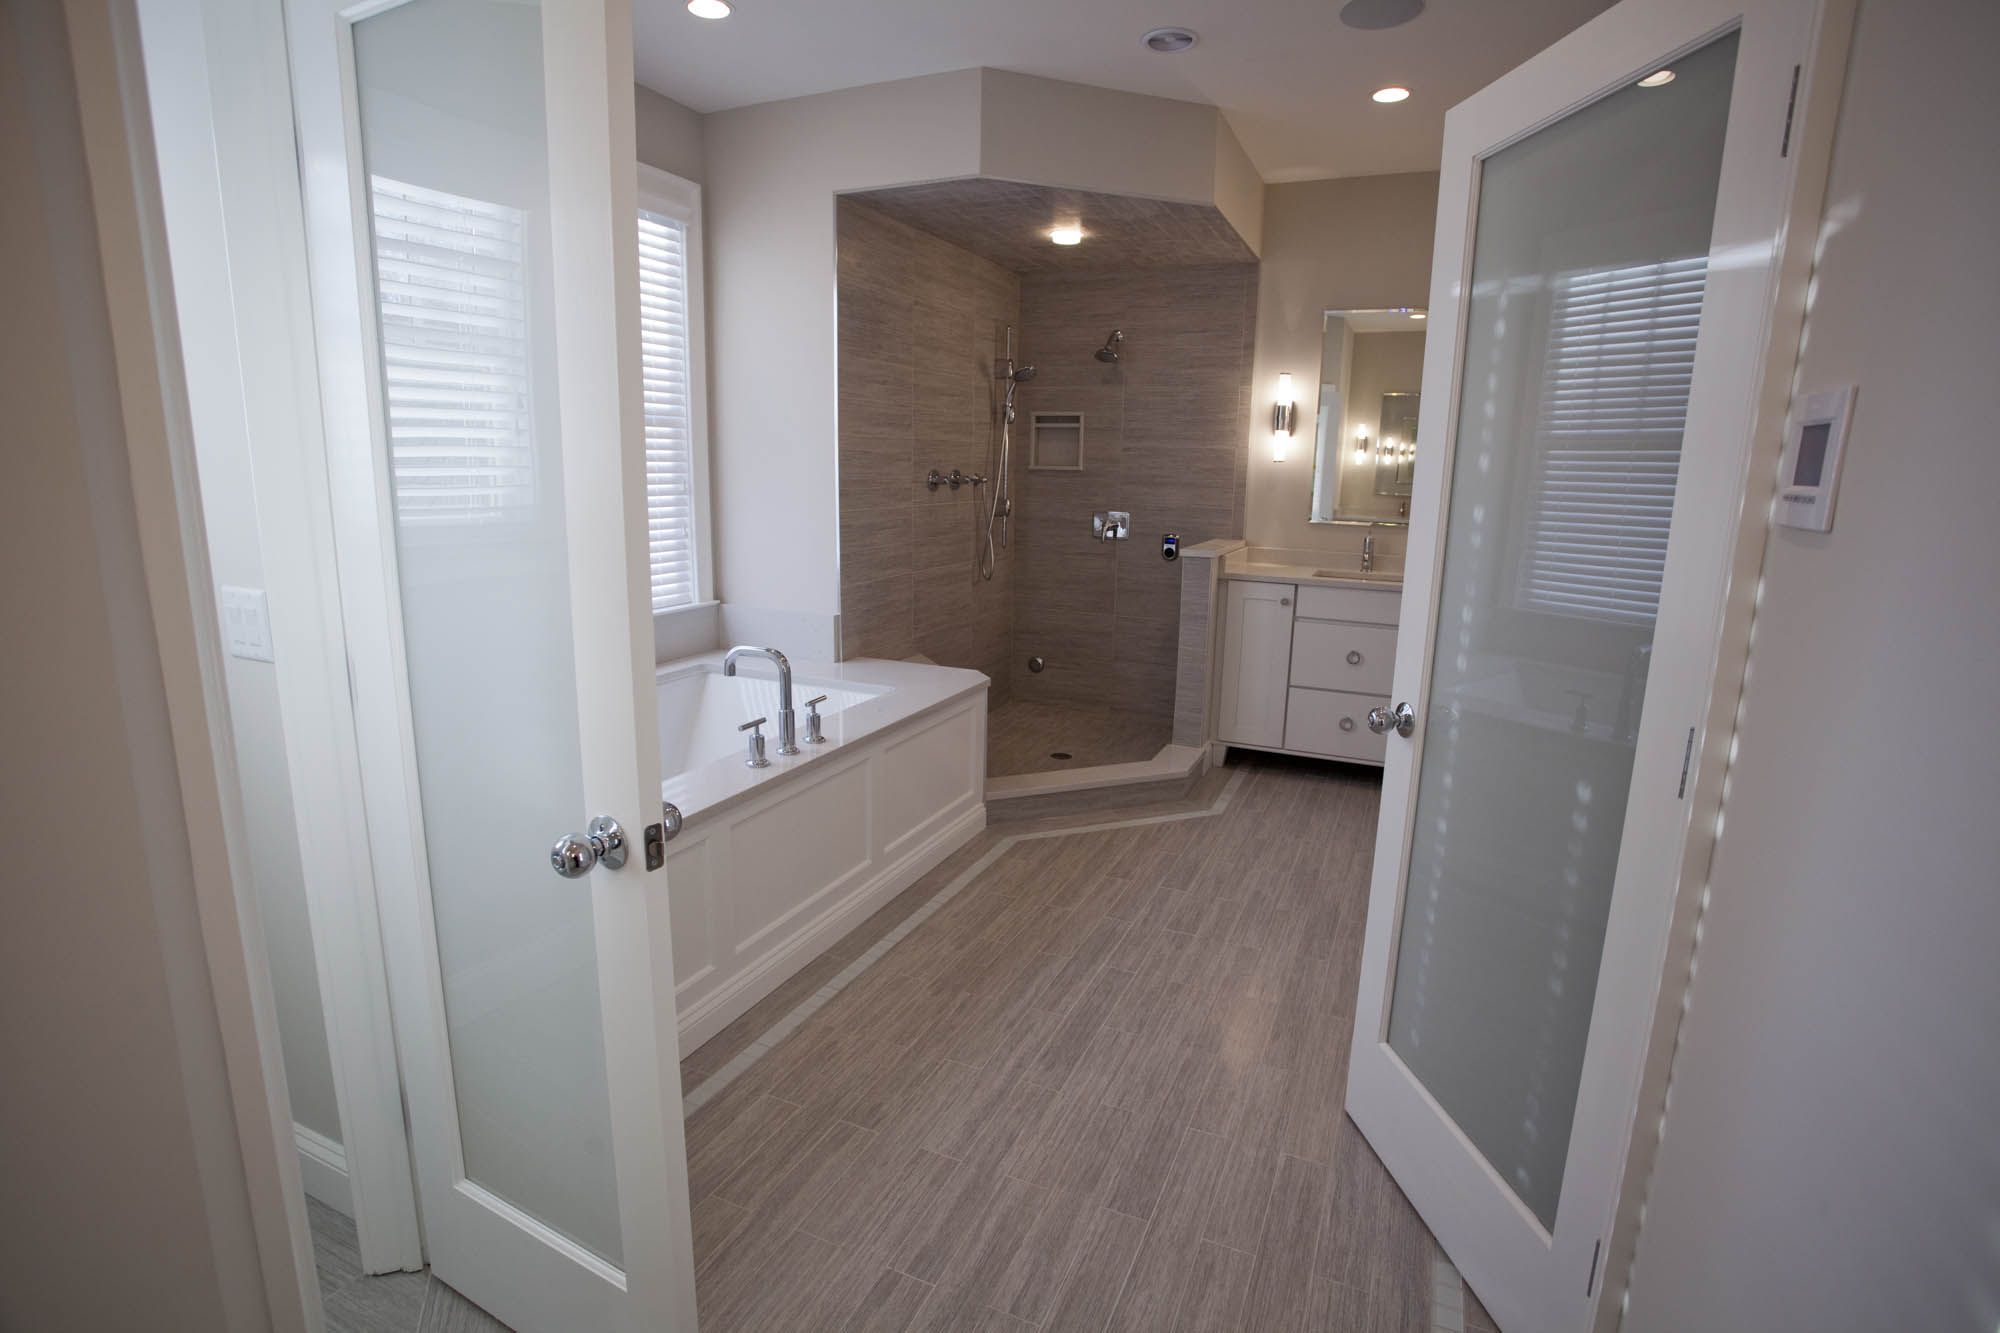 Bathrooms Bathroom House Bathroom Modular Homes Trailer home bathroom ideas top